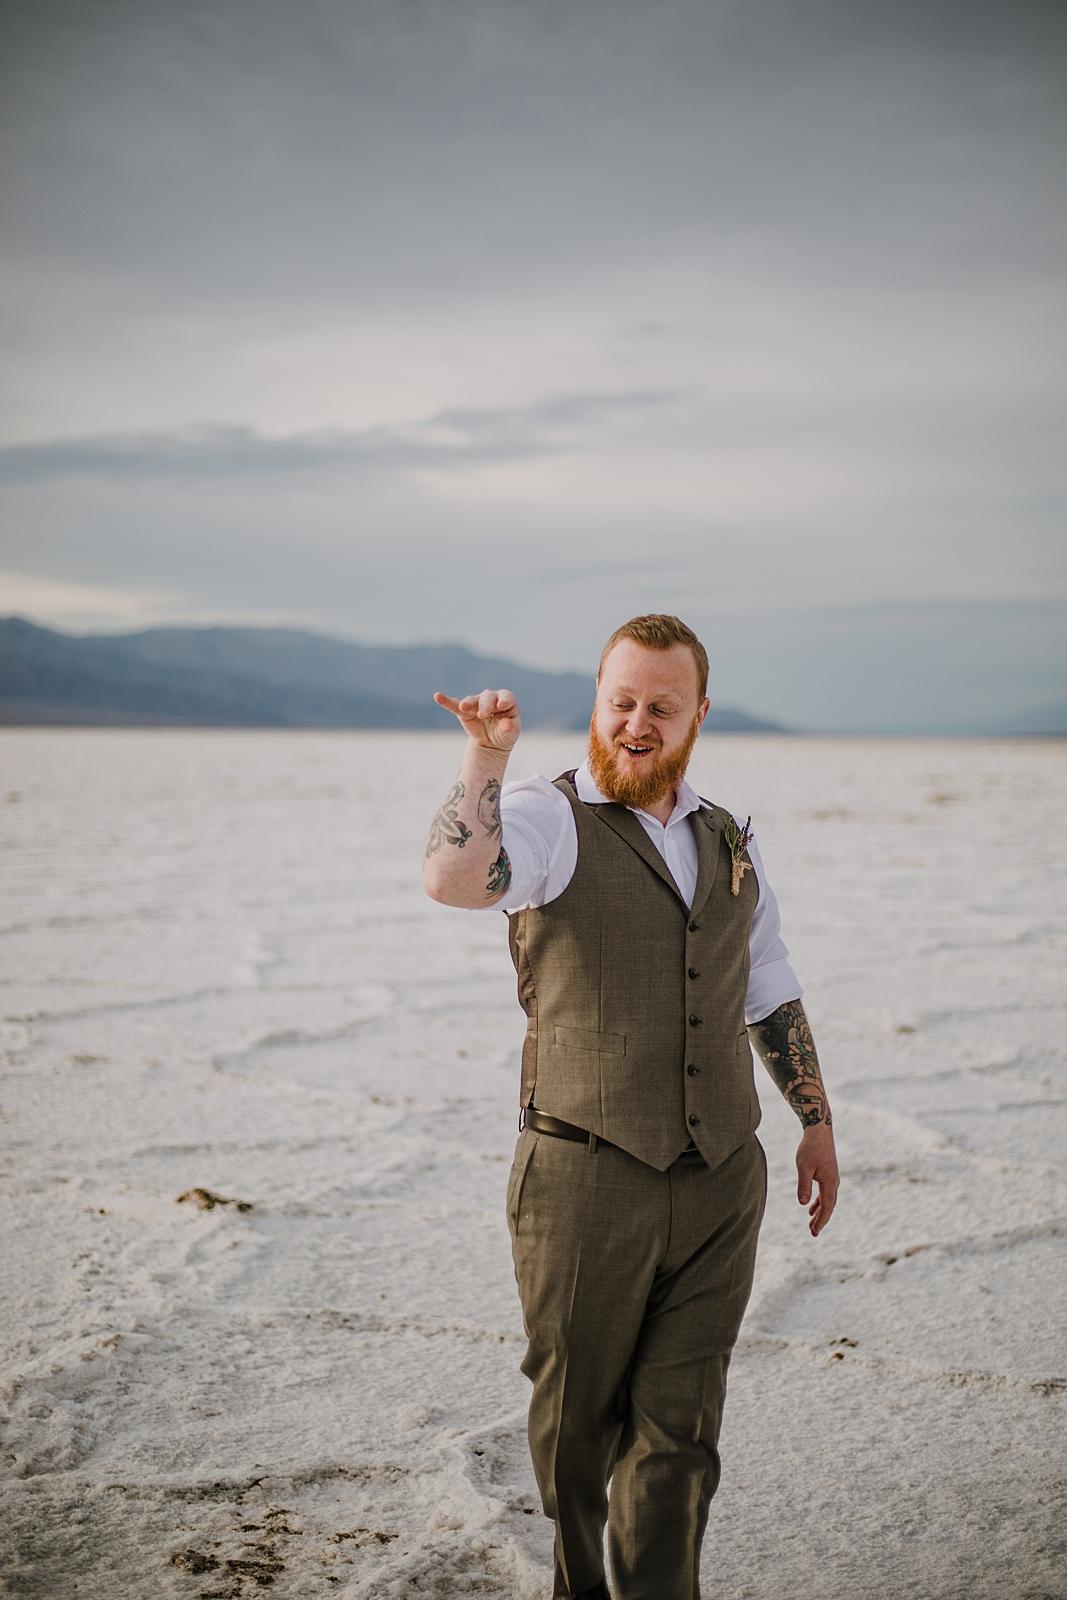 salt bae groom on the salt flats, death valley national park elopement, elope in death valley, badwater basin elopement, hiking in death valley national park, sunset at badwater basin